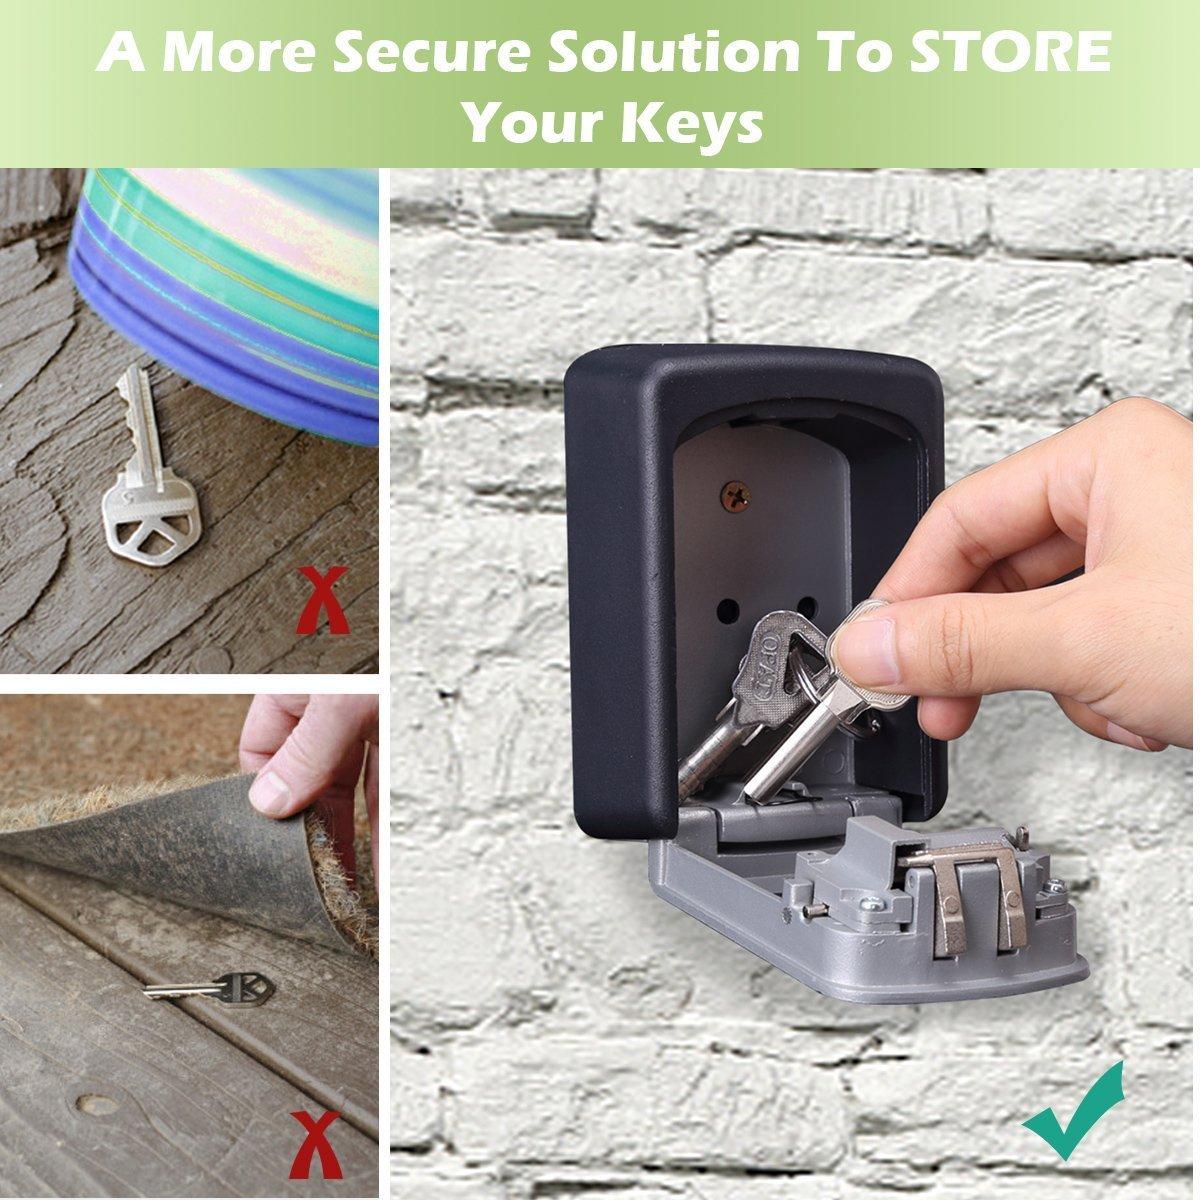 Key Lock Box, Exterior Outdoor Waterproof Hide Wall Mounted Key Safe Box - House use Key Storage Lock Box by YA MI (Image #2)